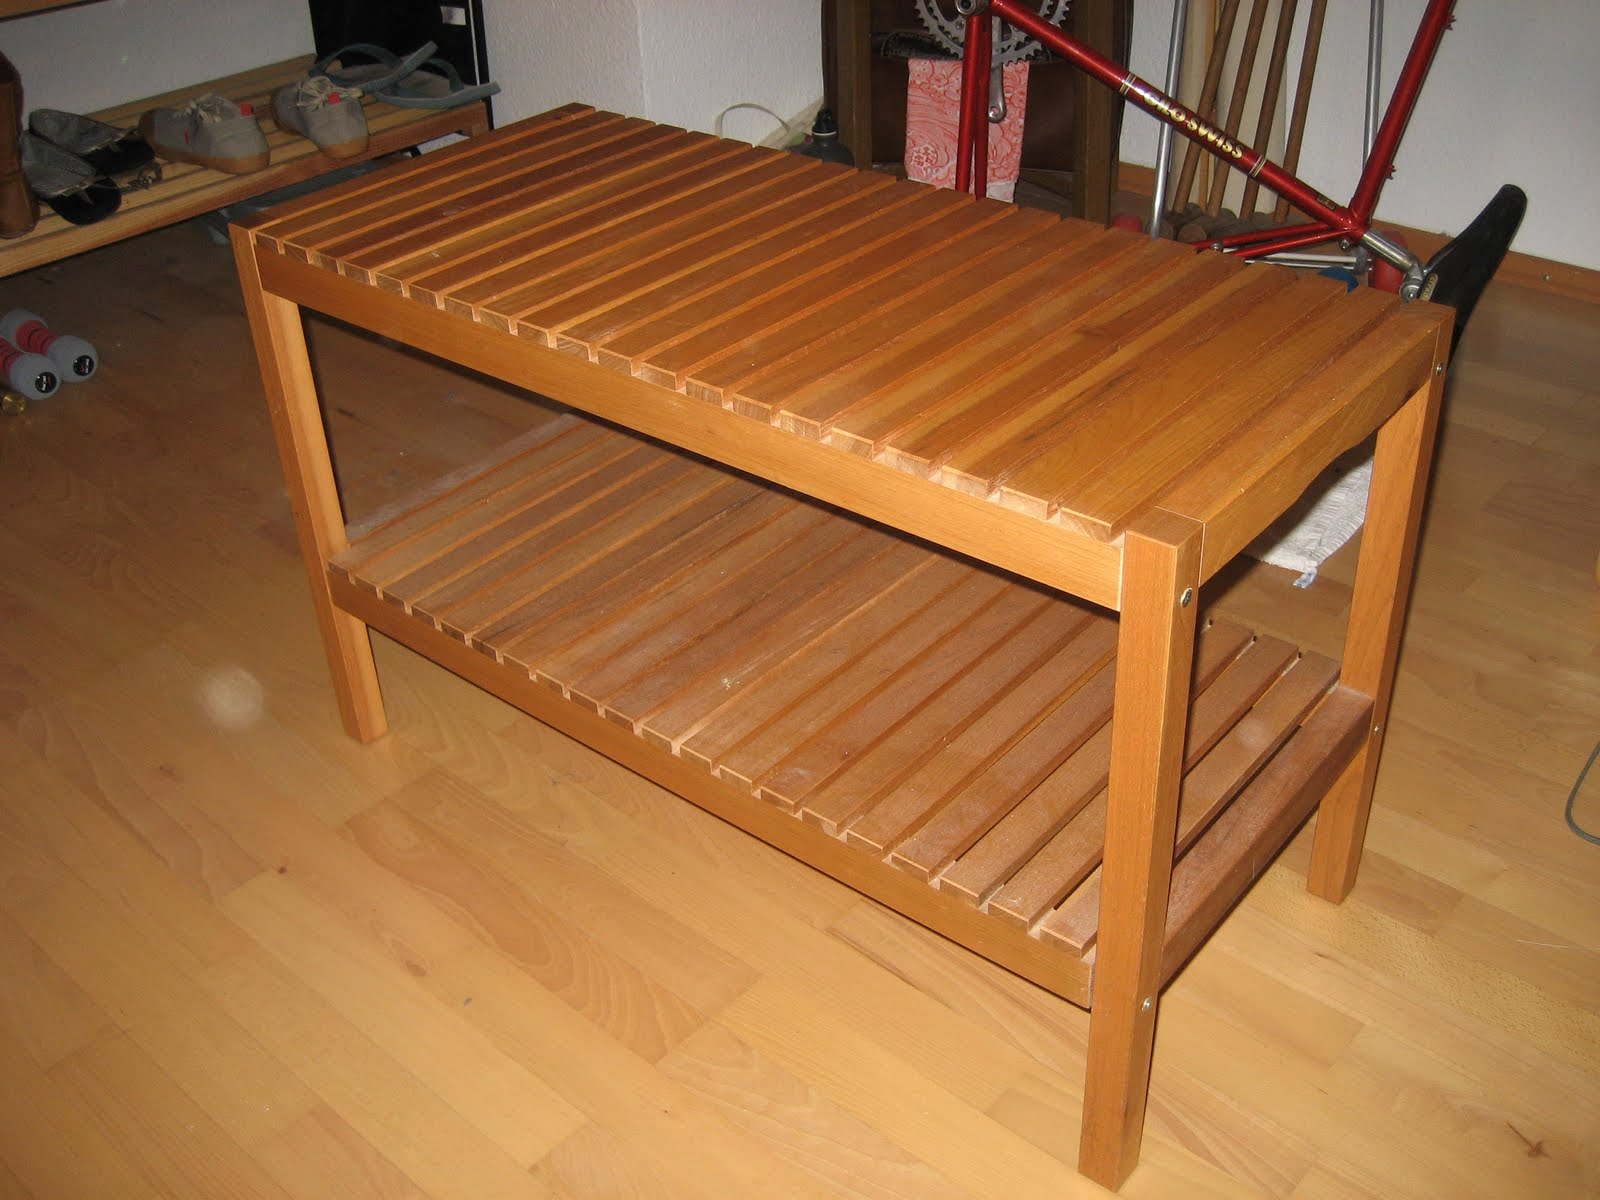 zu verkaufen ikea molger bench shelf 15 sold. Black Bedroom Furniture Sets. Home Design Ideas